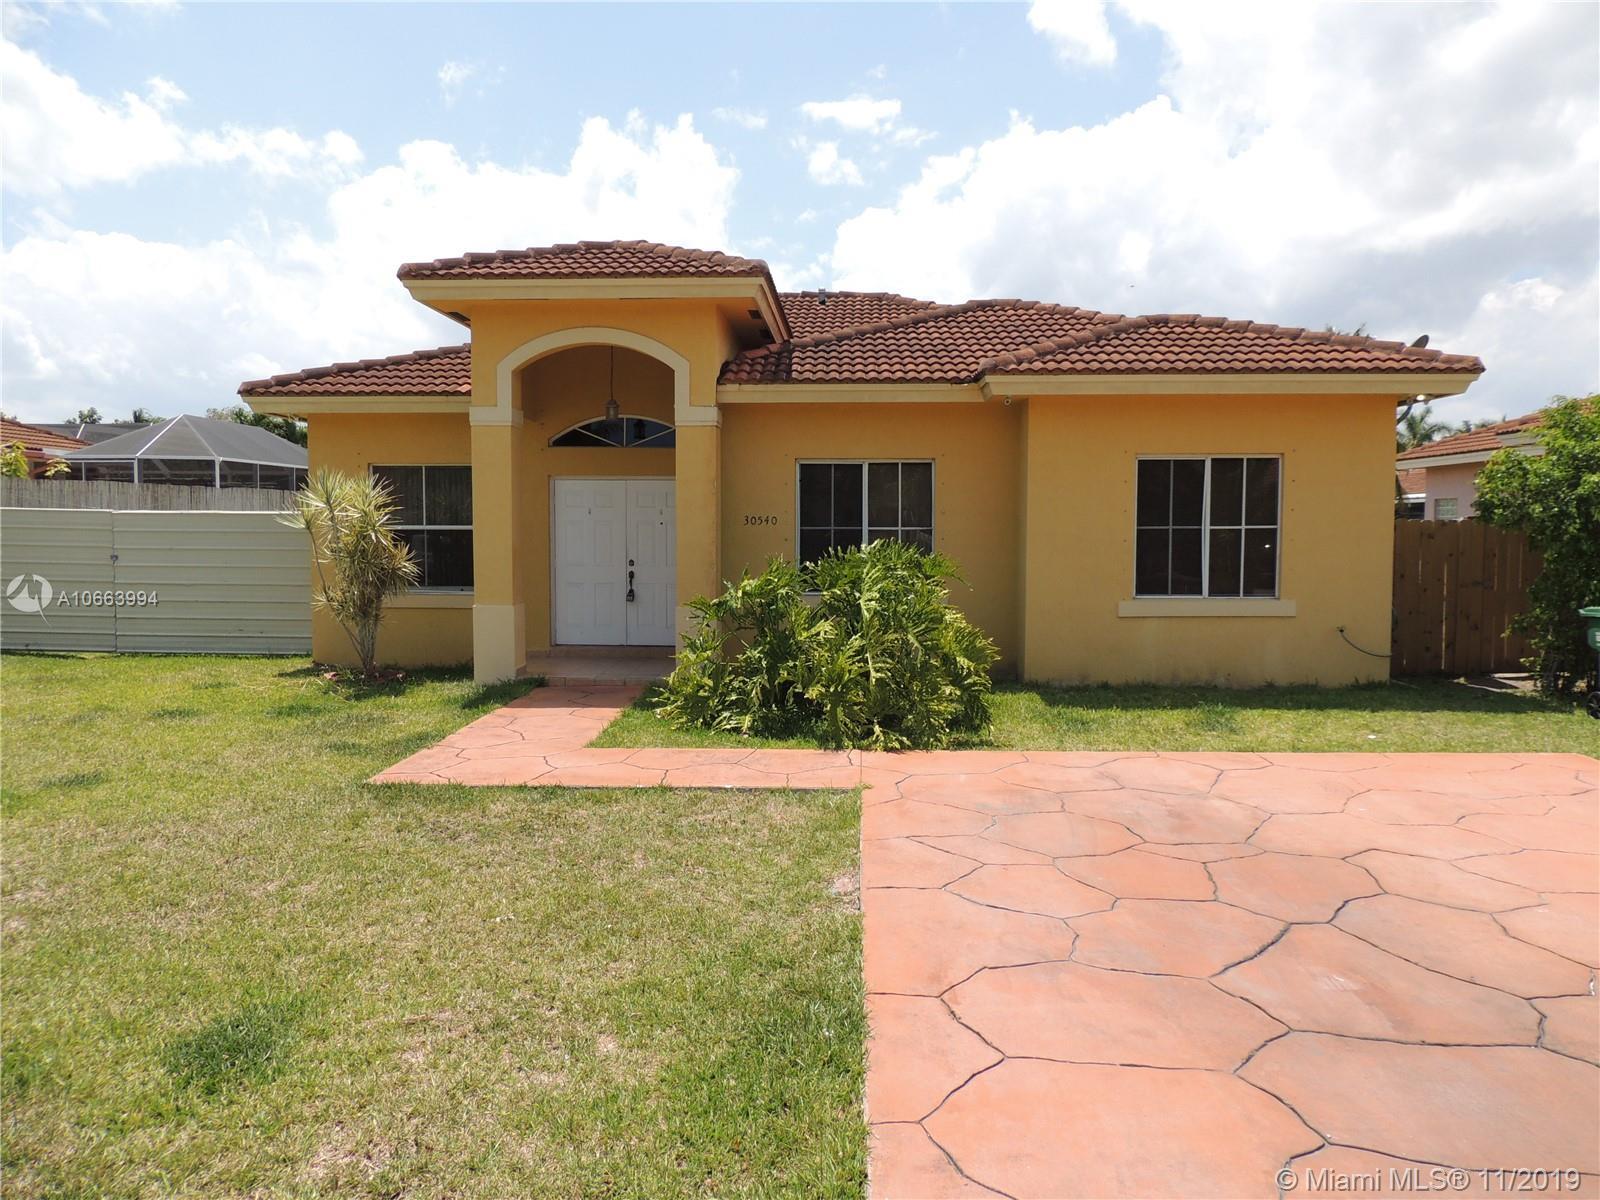 Kings Homes Real Estate Listings Main Image